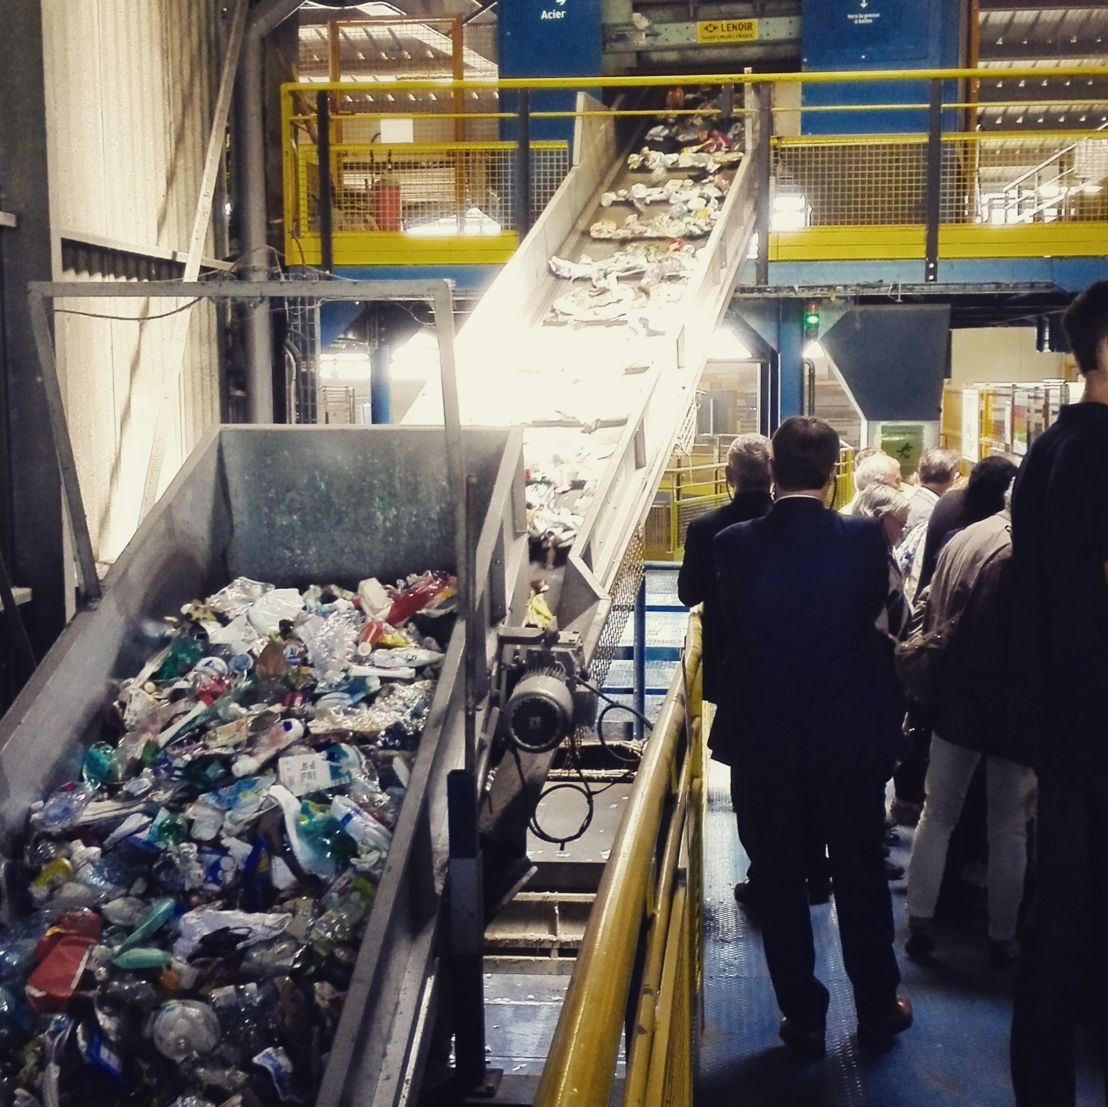 Visit of Kerval Centre Armor sorting center